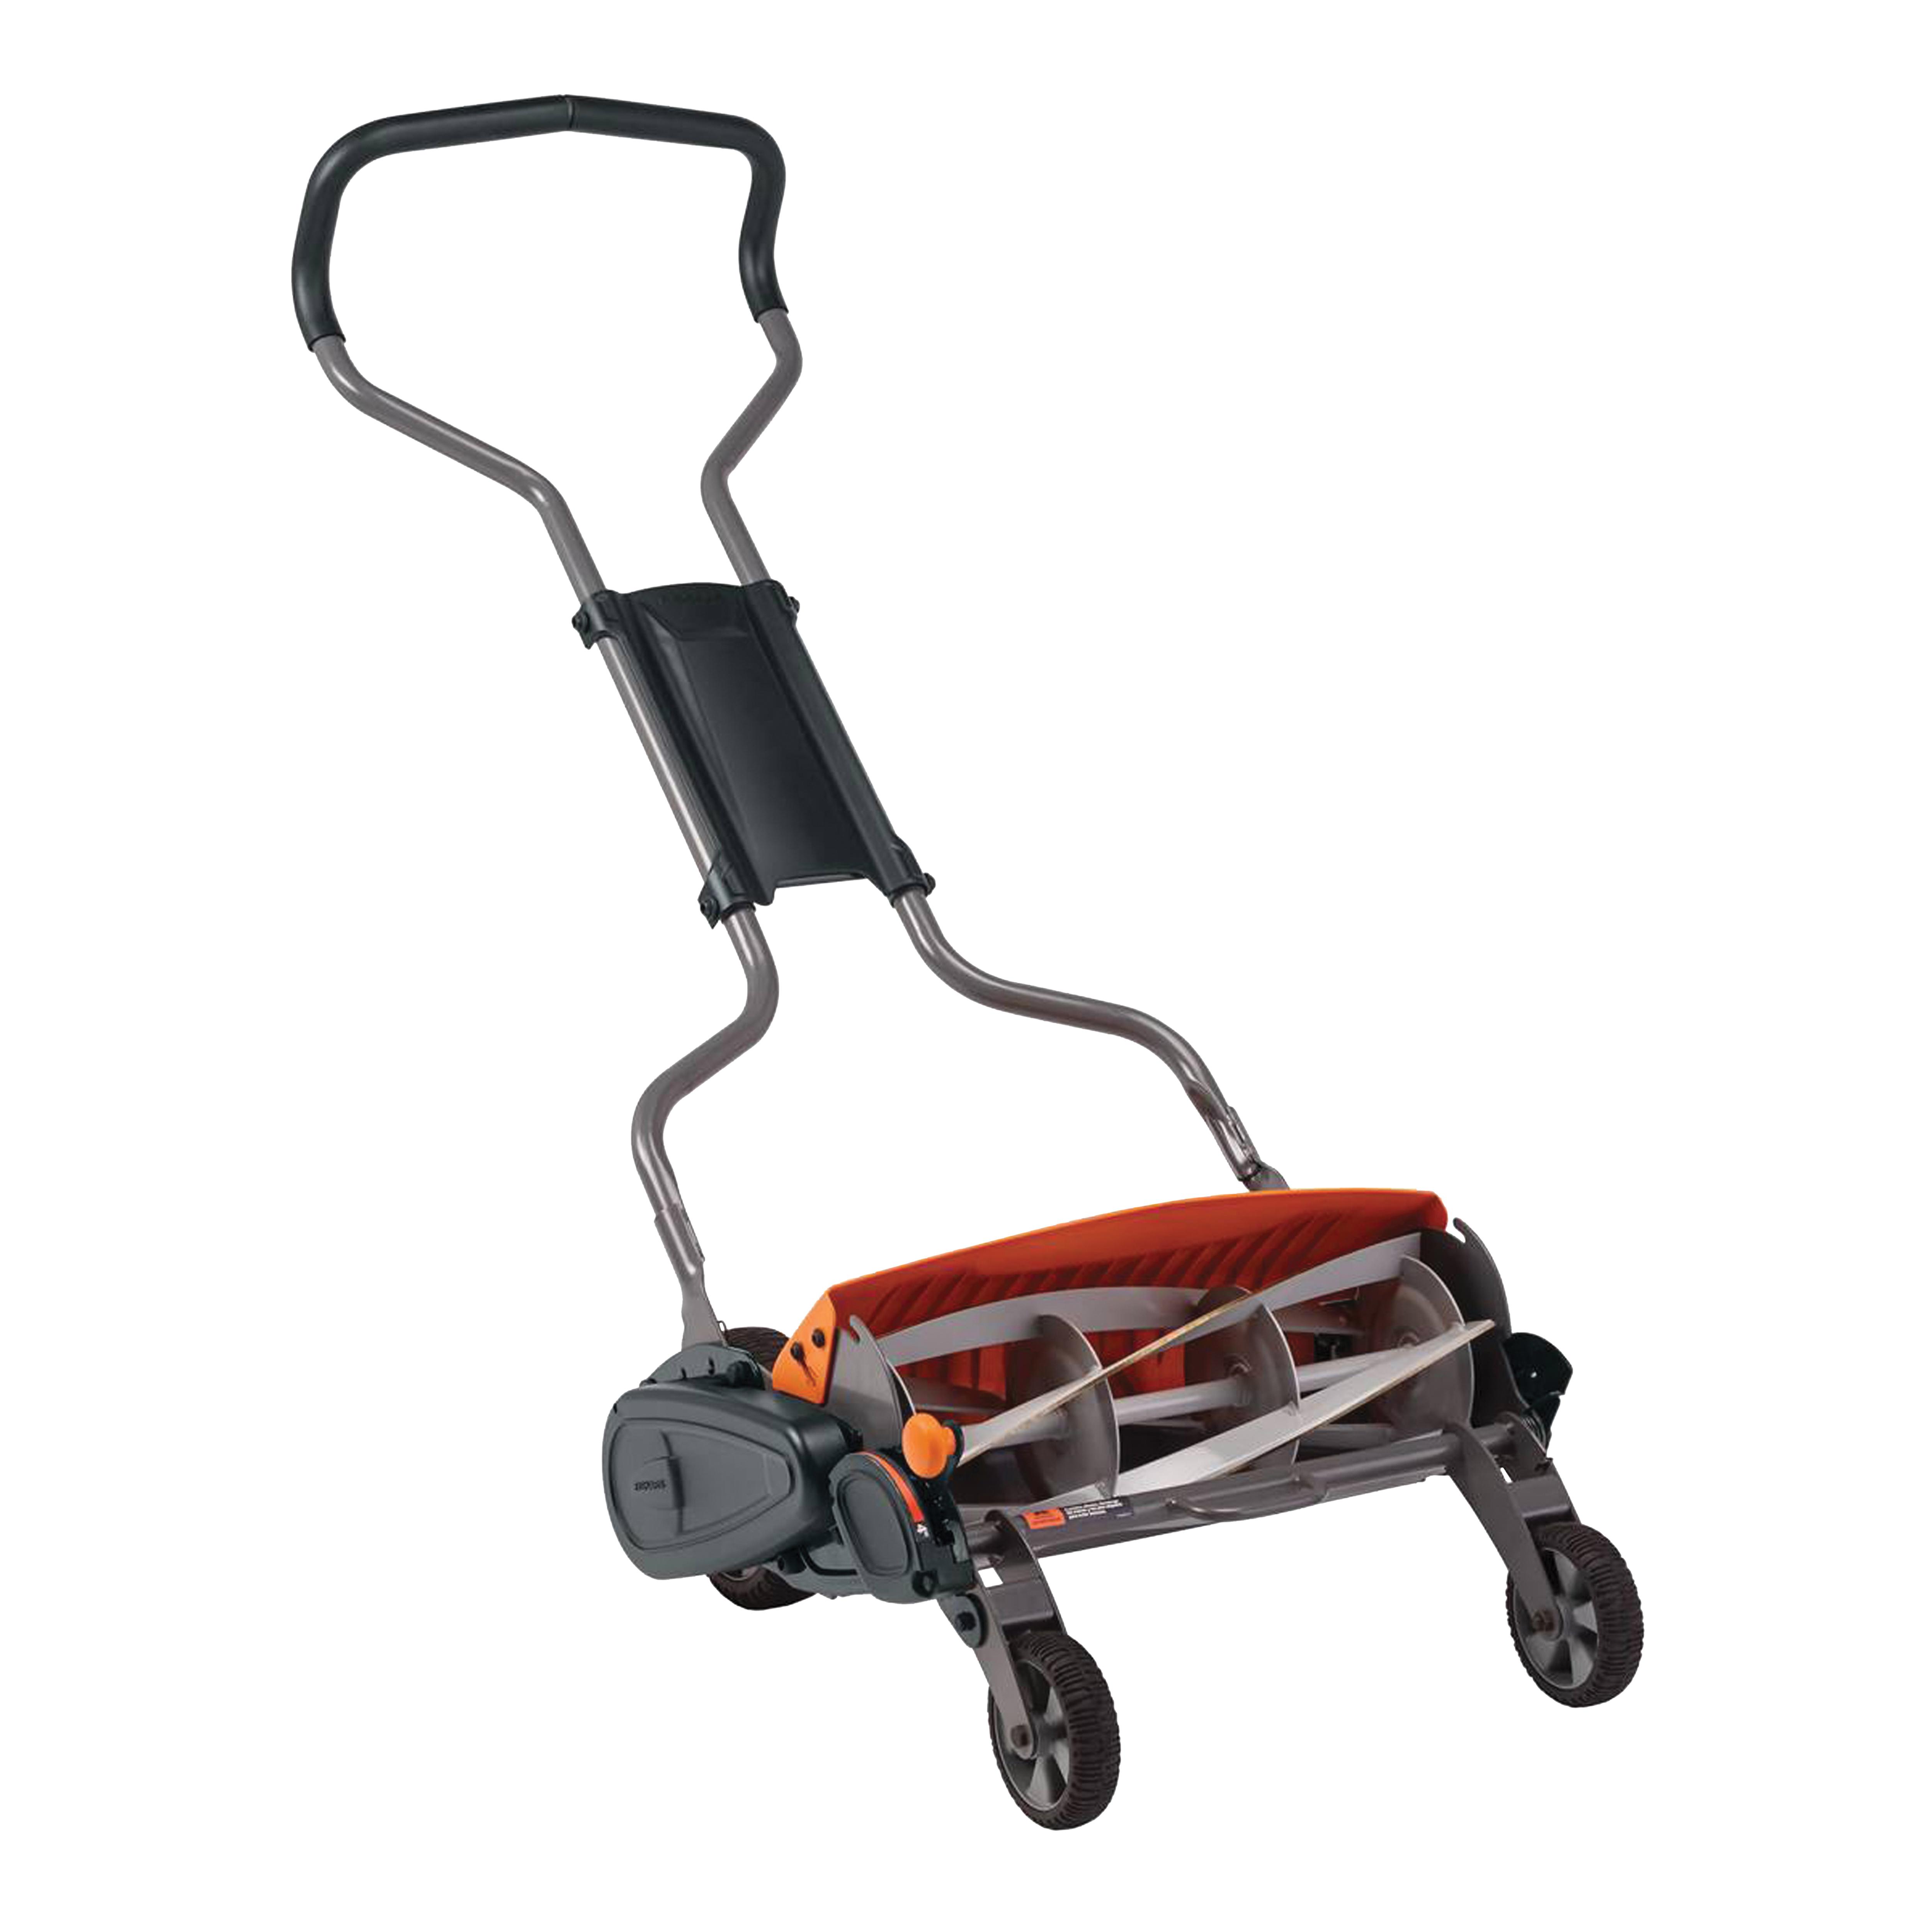 Picture of FISKARS StaySharp 362050-1001 Reel Lawn Mower, 18 in W Cutting, Reel Blade